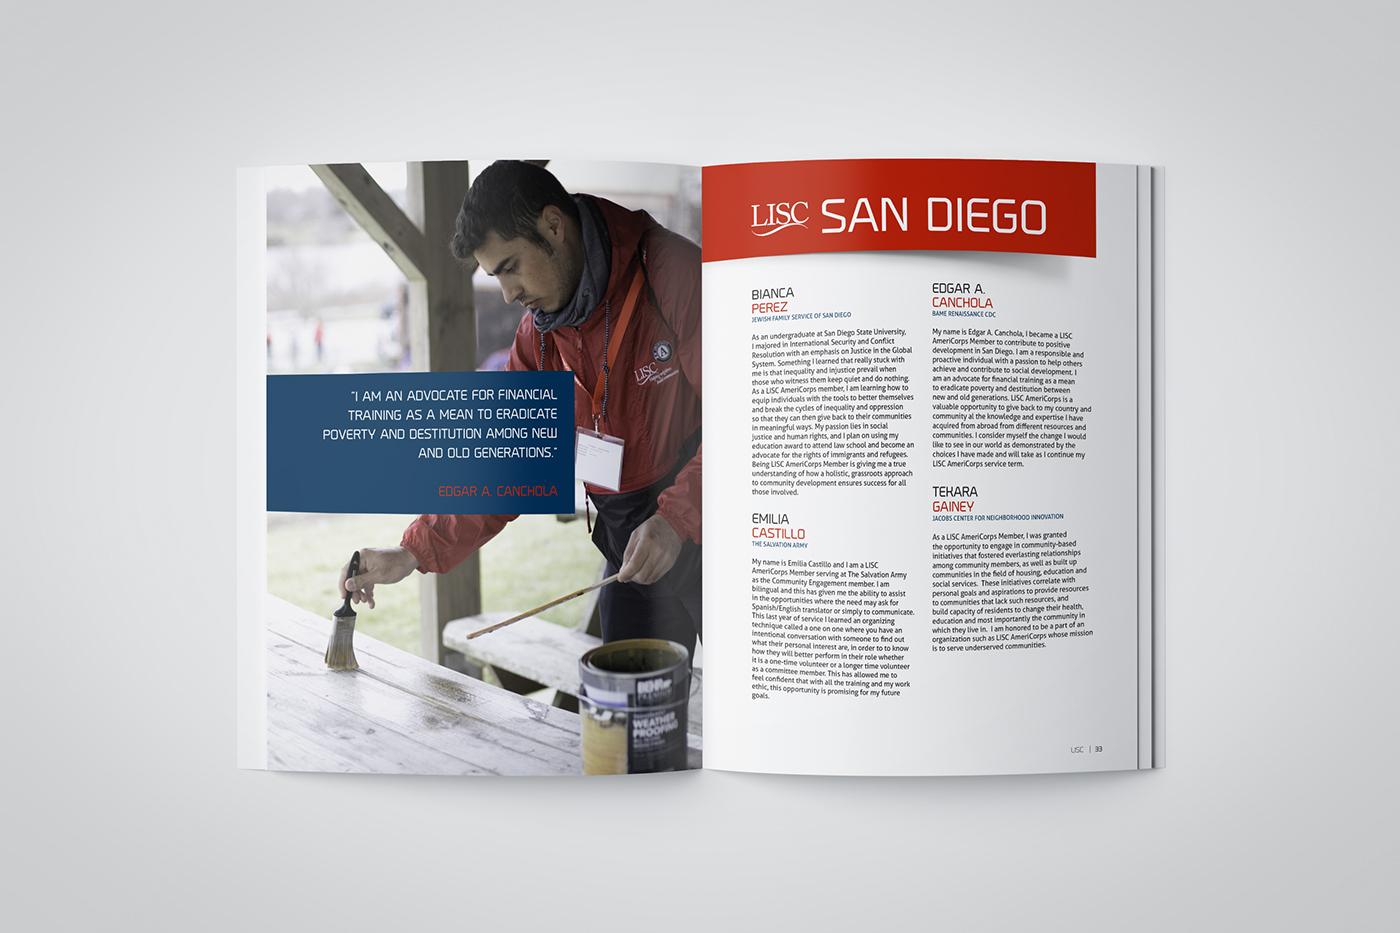 Americorps publication united states community service service